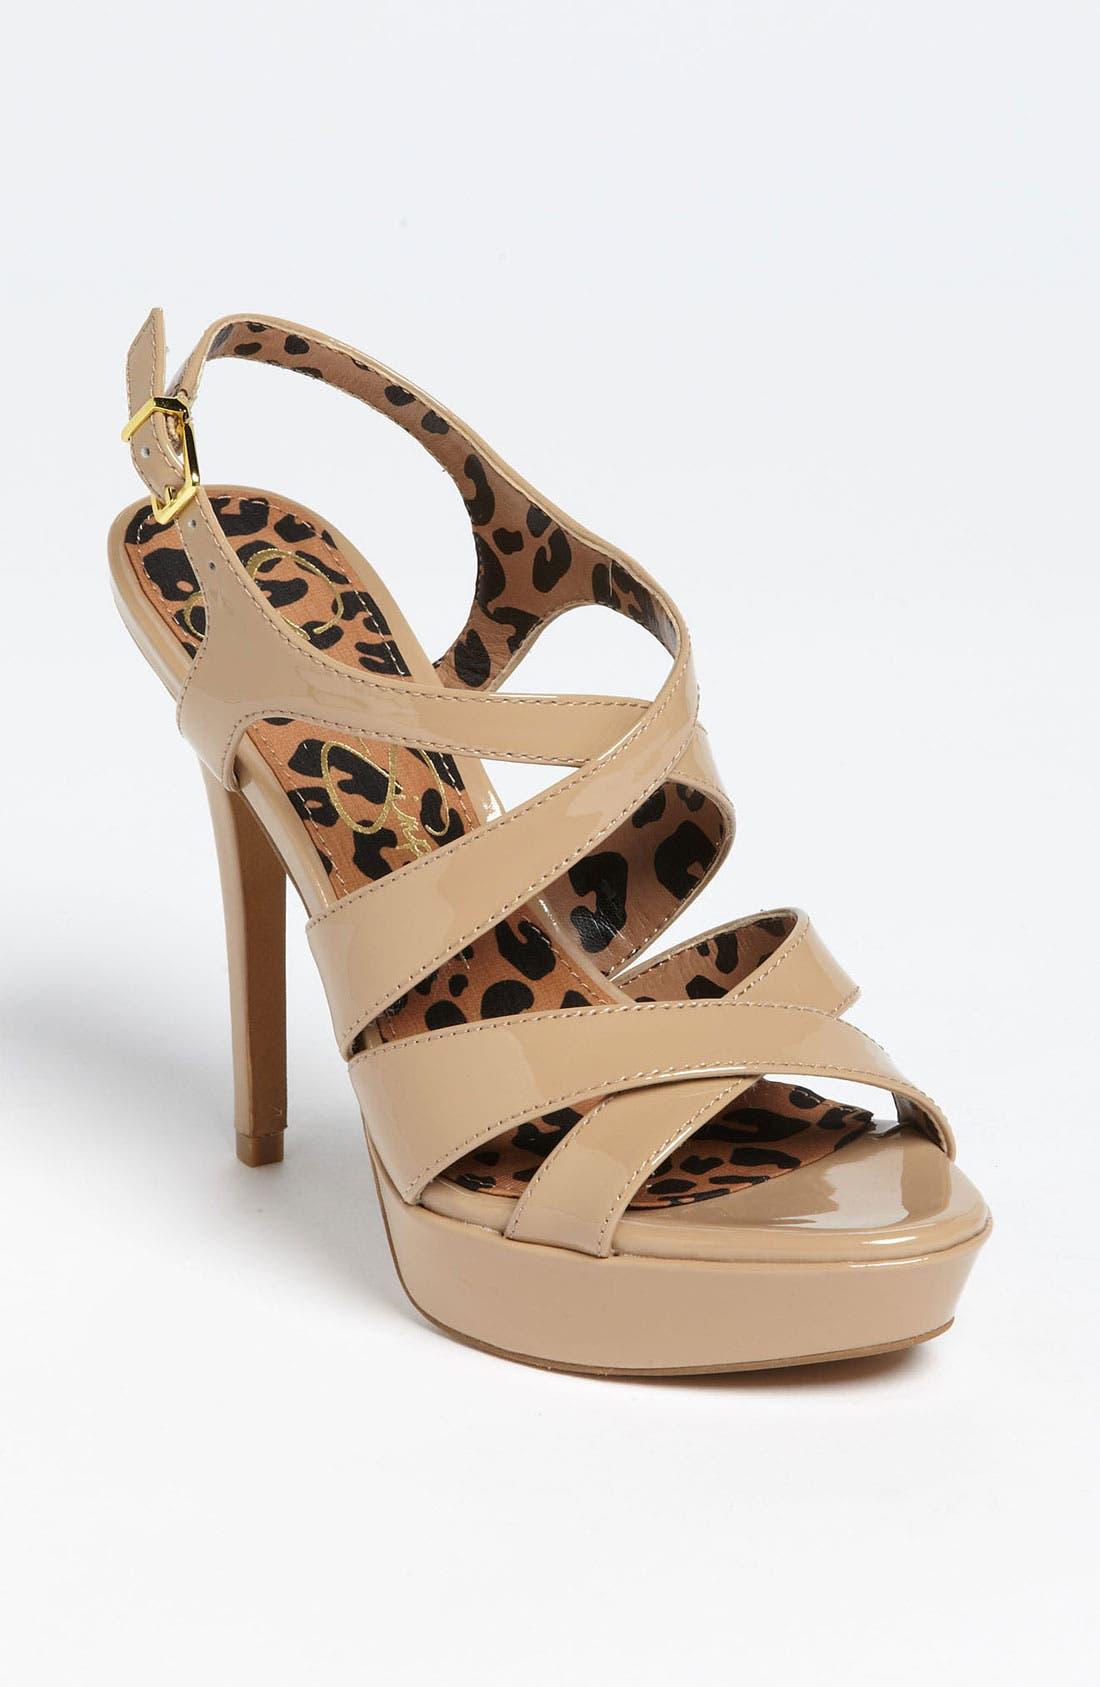 Alternate Image 1 Selected - Jessica Simpson 'Bianca' Sandal